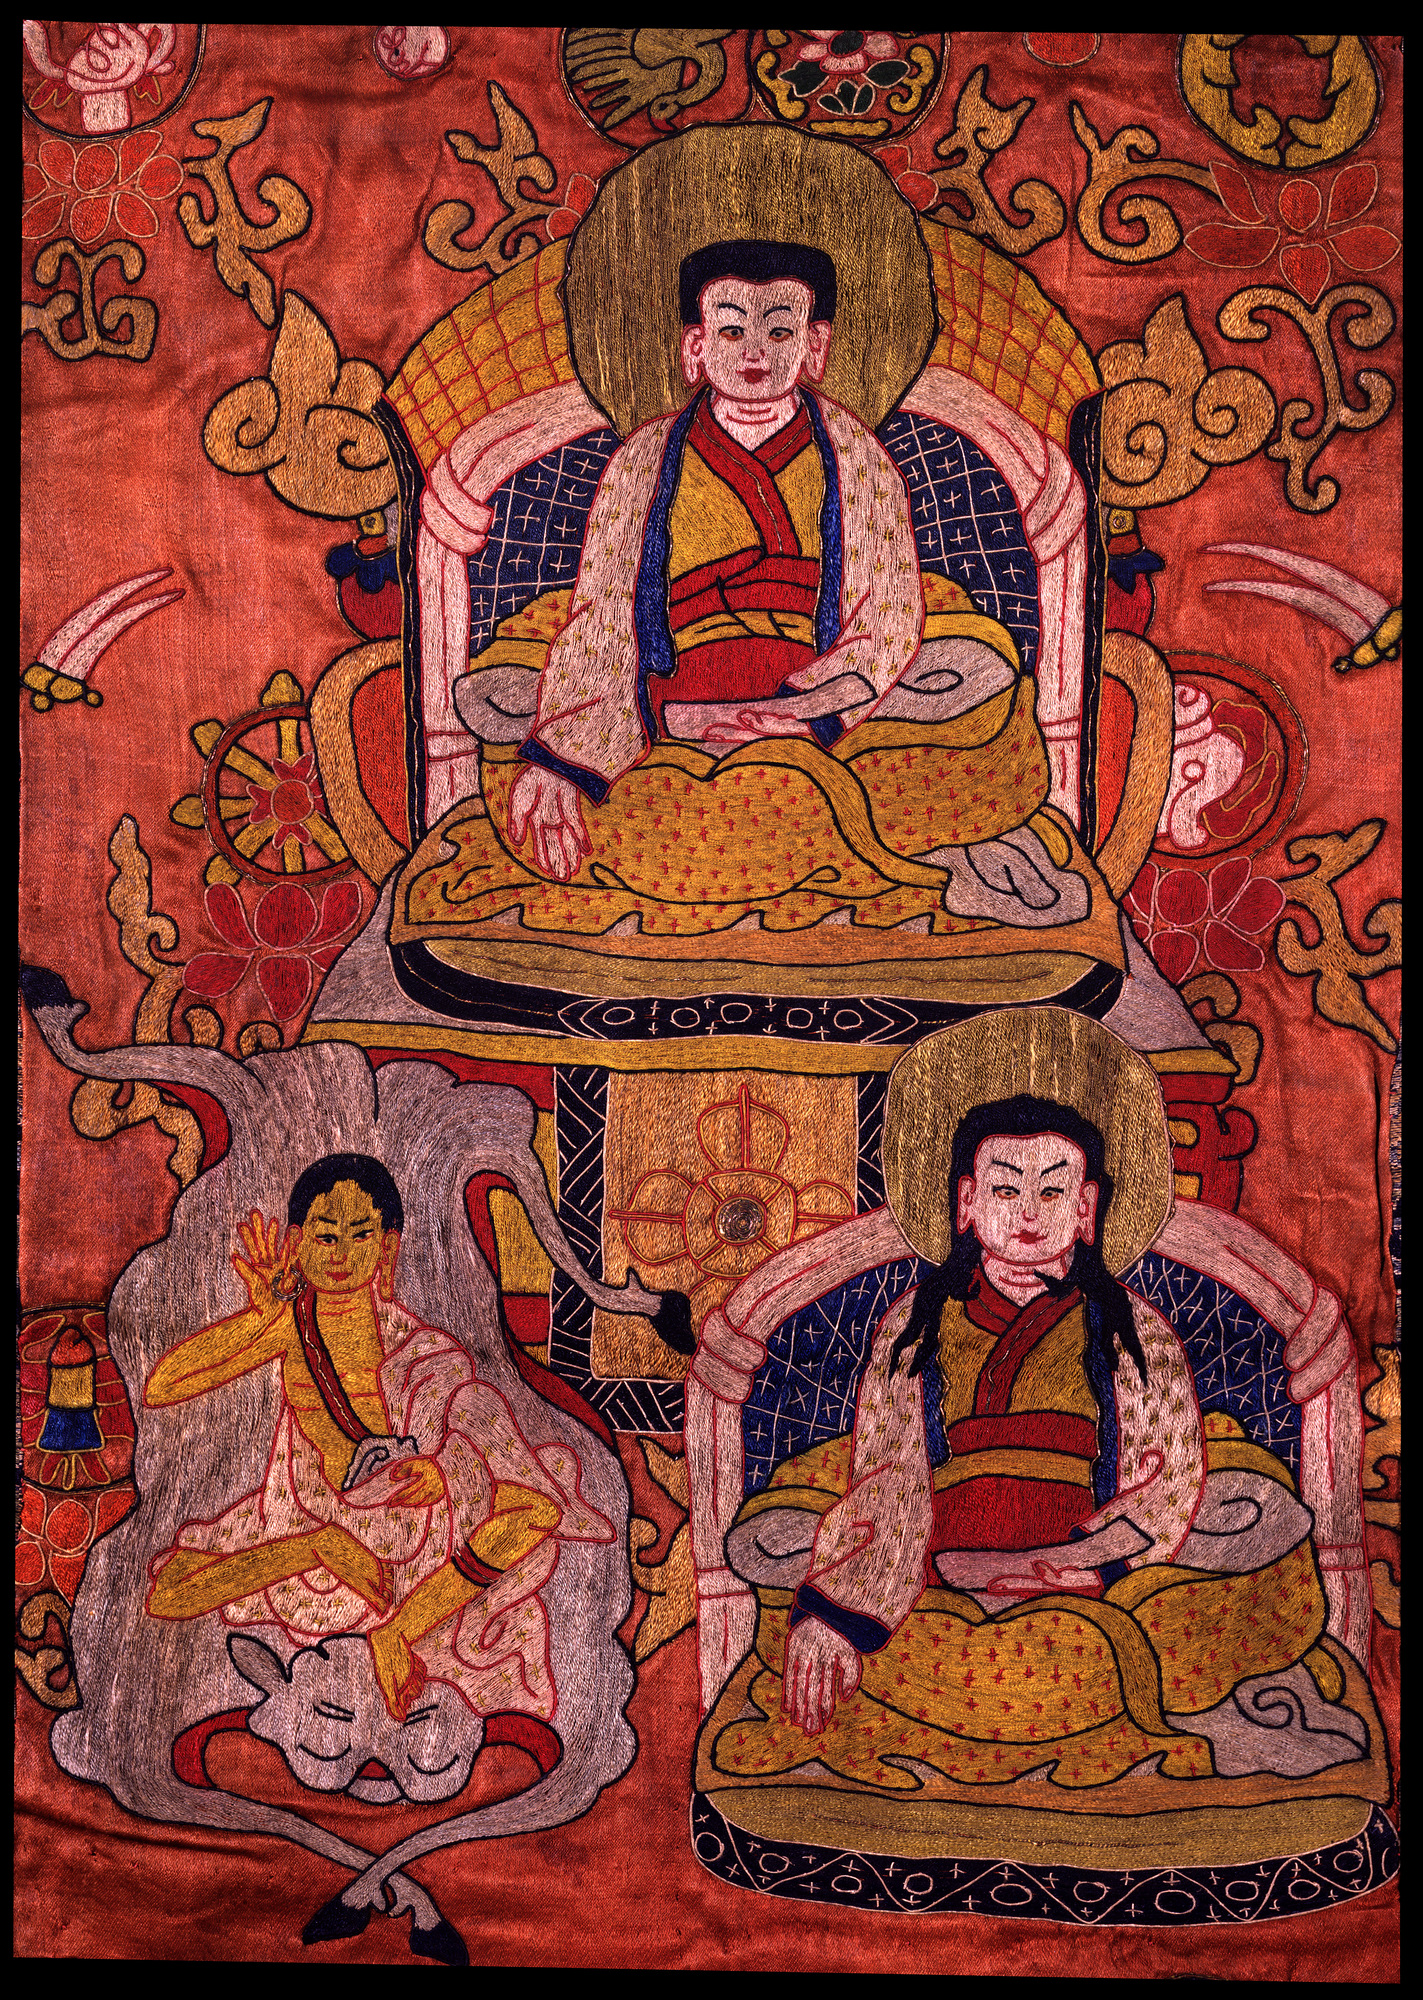 Image of Lama Marpa Chokyi Lodro Tapestry